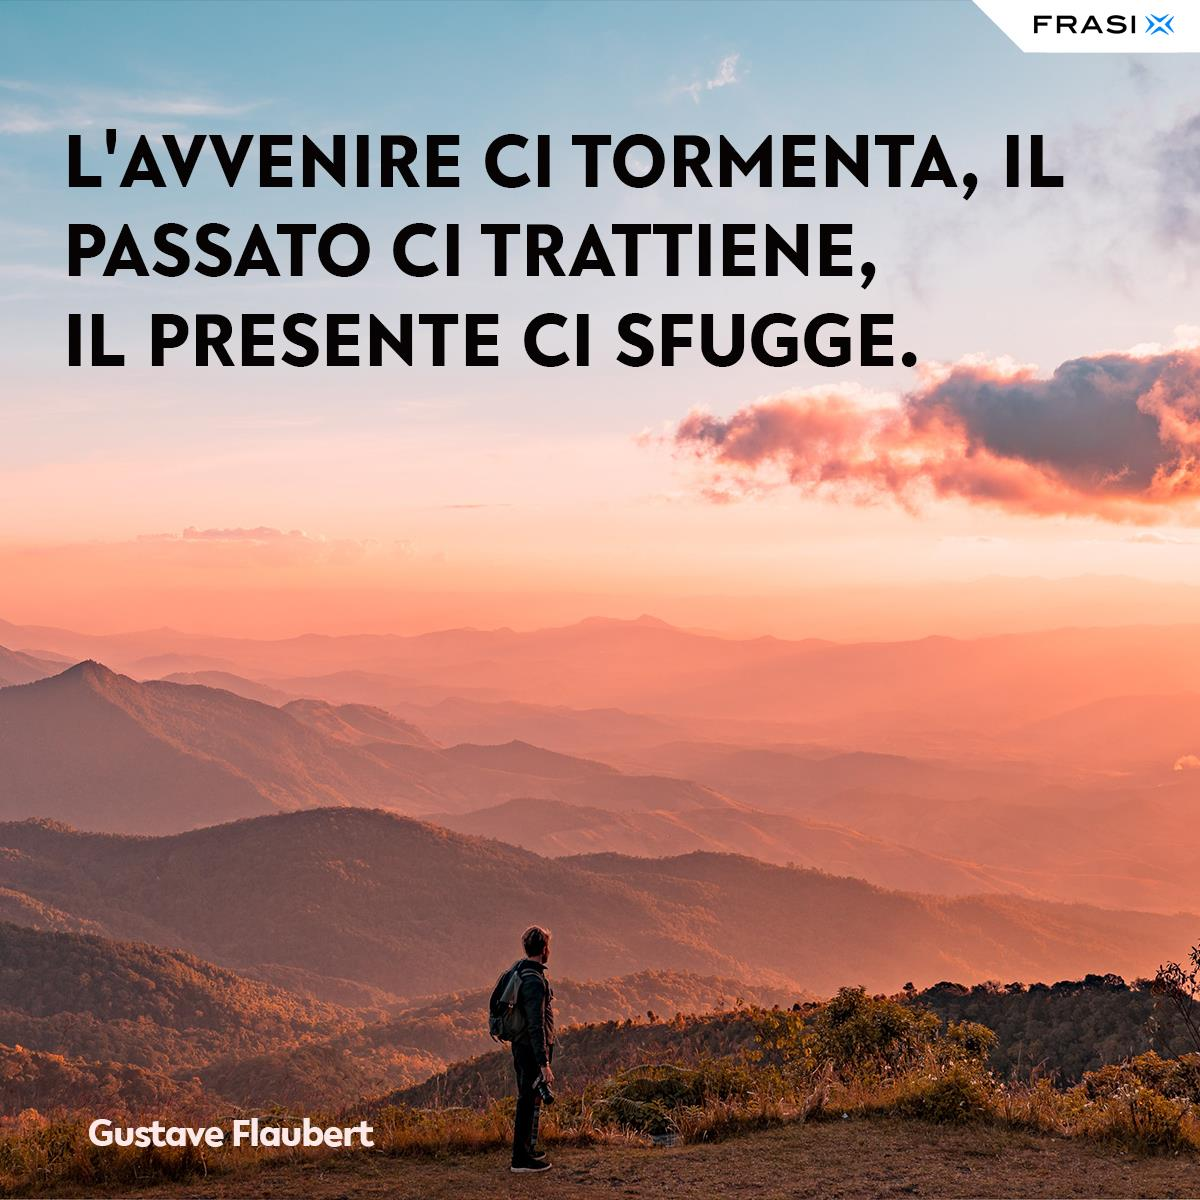 Frasi tempo post social Gustave Flaubert